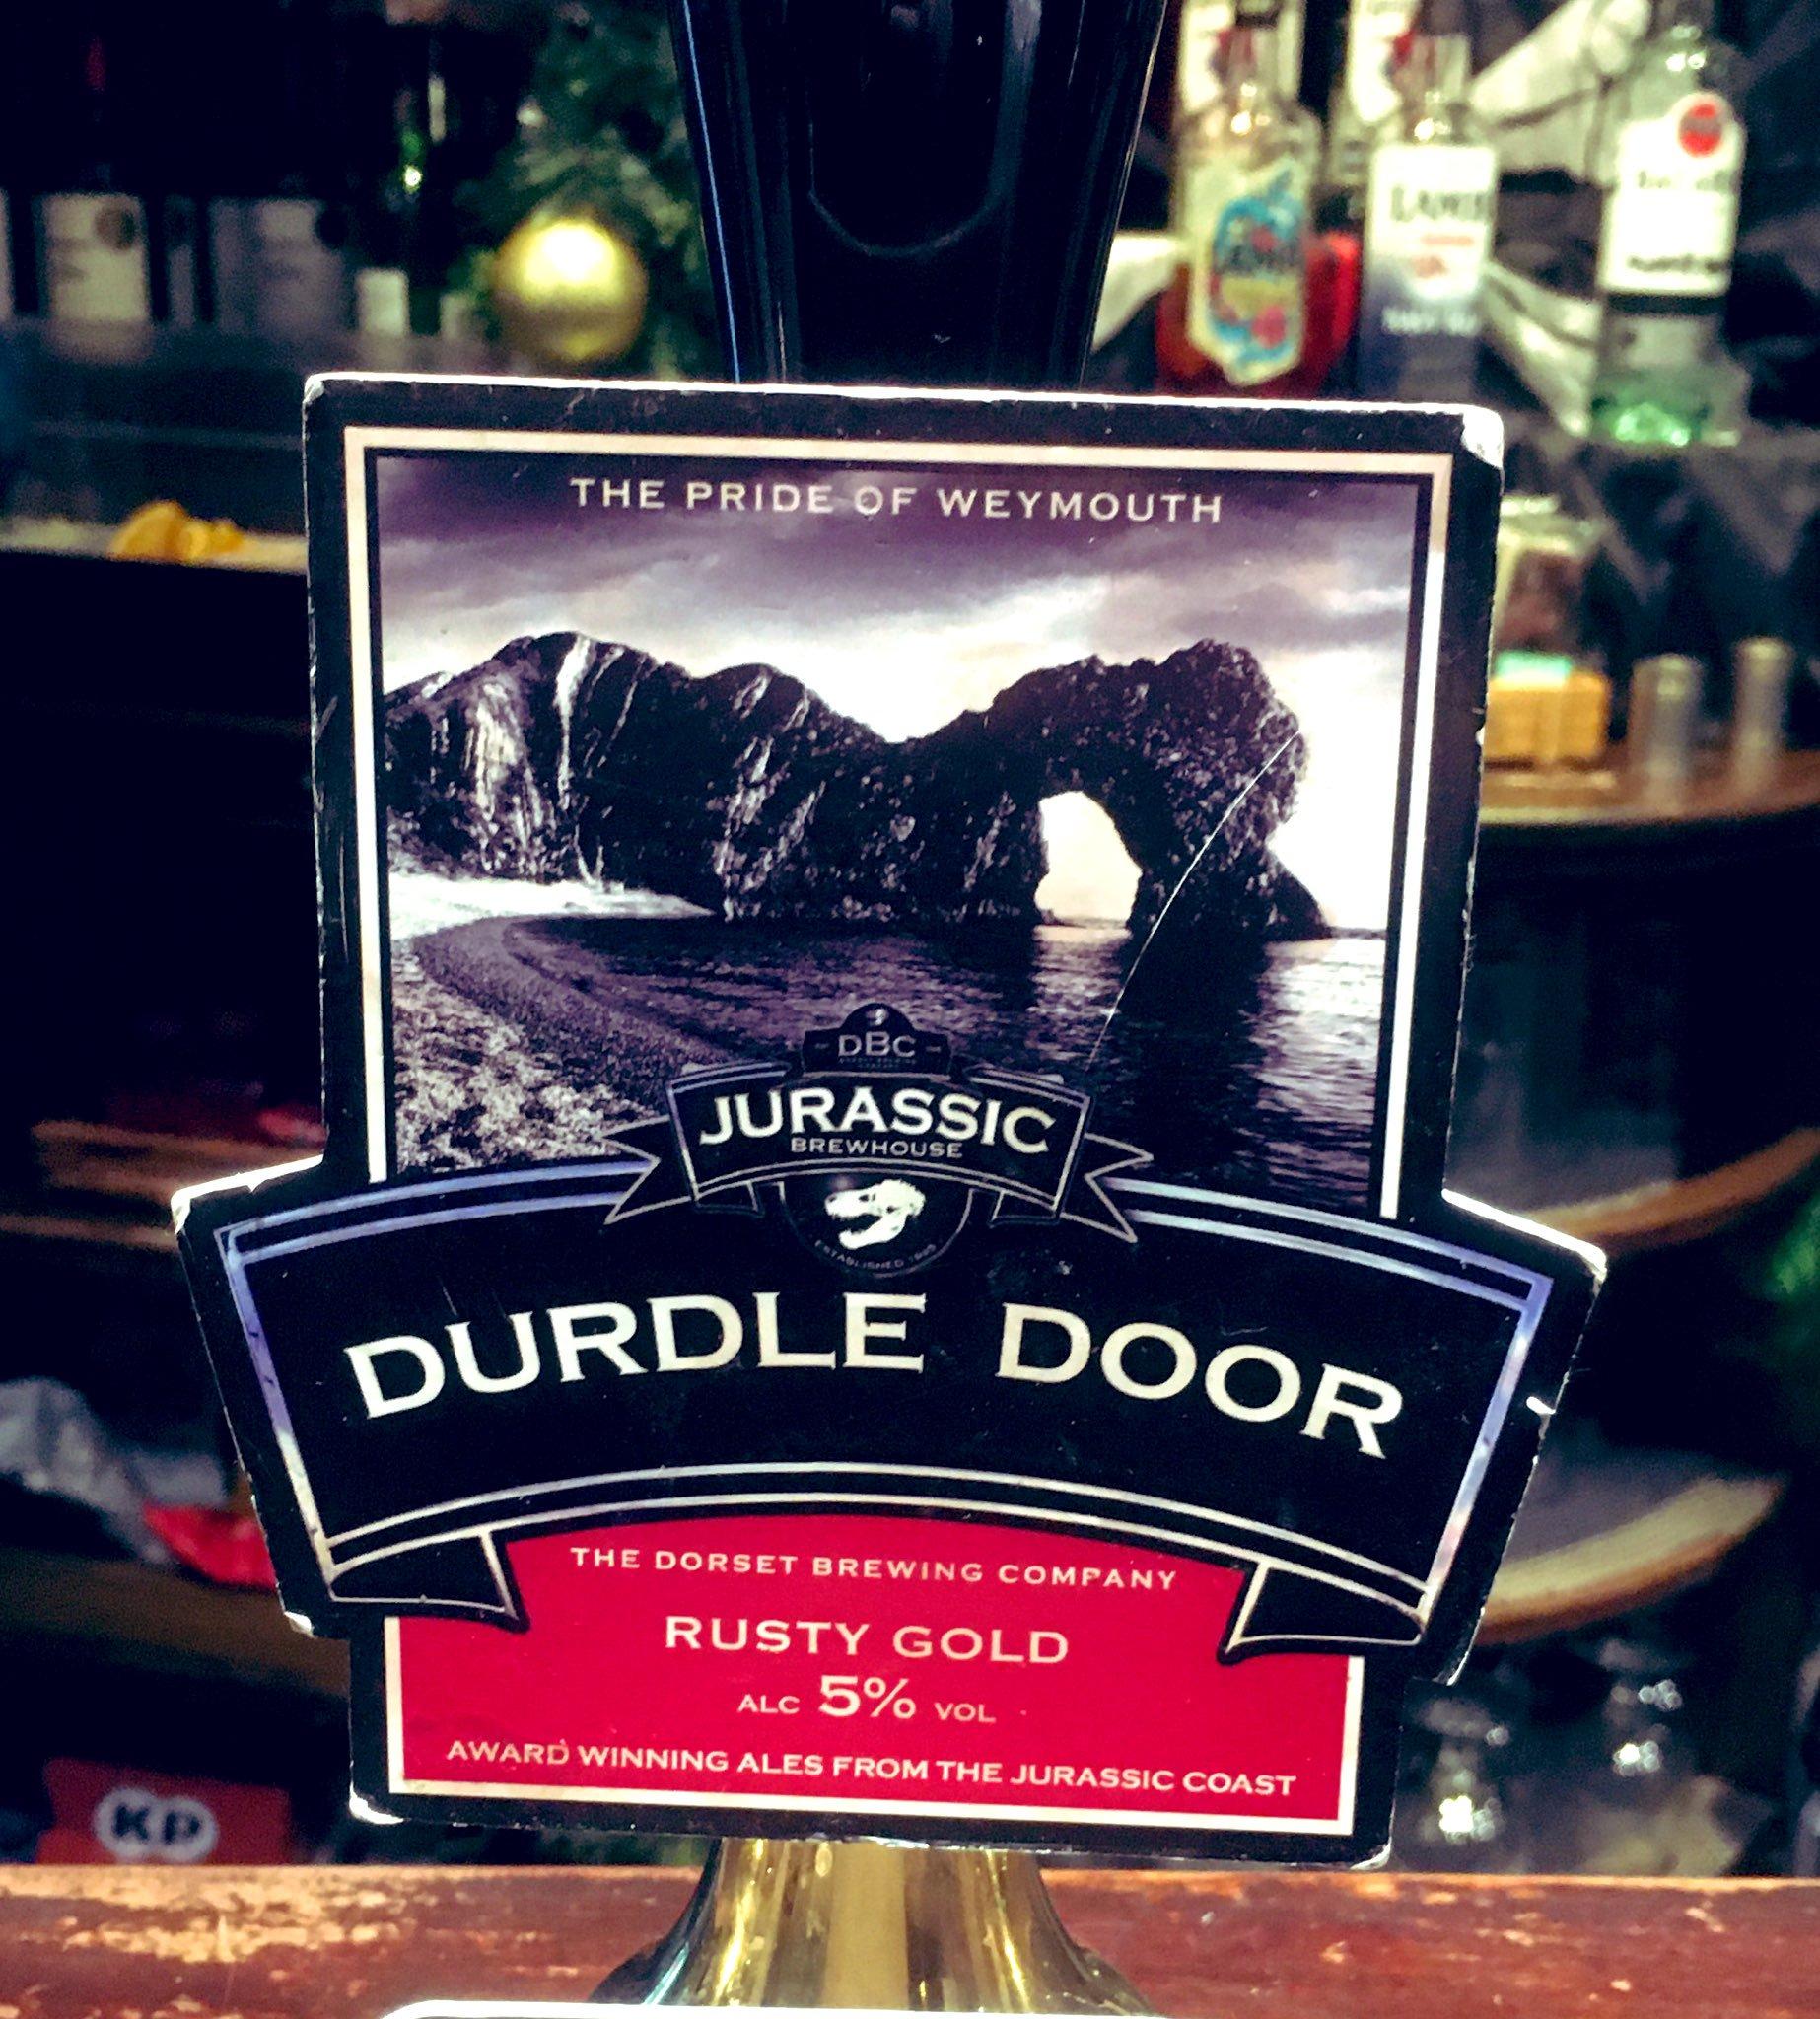 345: Durdle Door